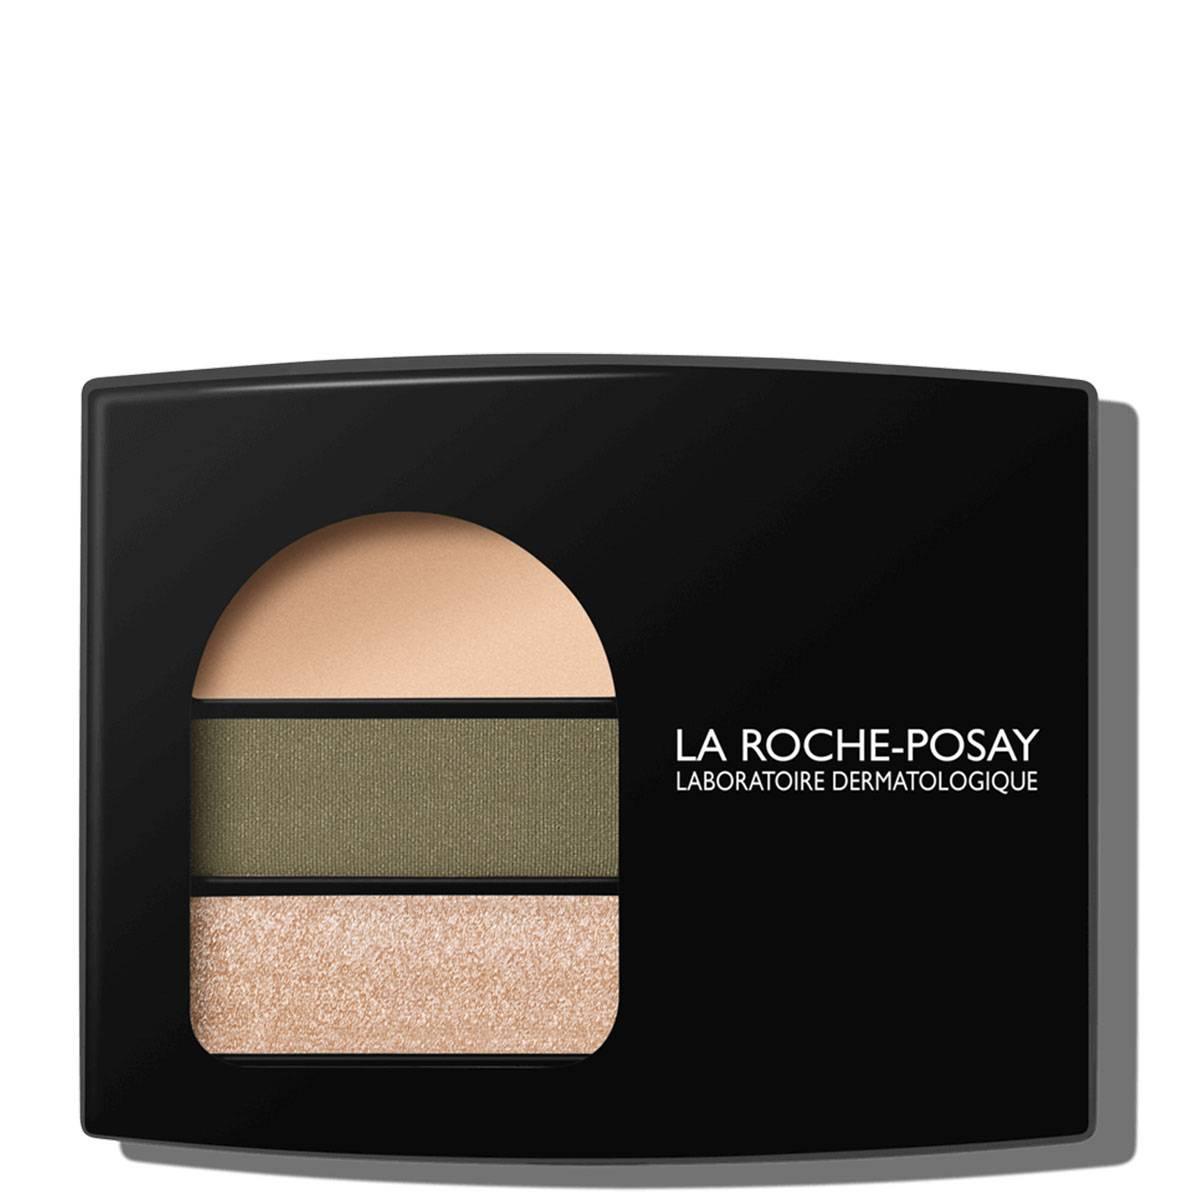 La Roche Posay Känslig Toleriane Make up EYE SHADOW DuoSmokyVert 333